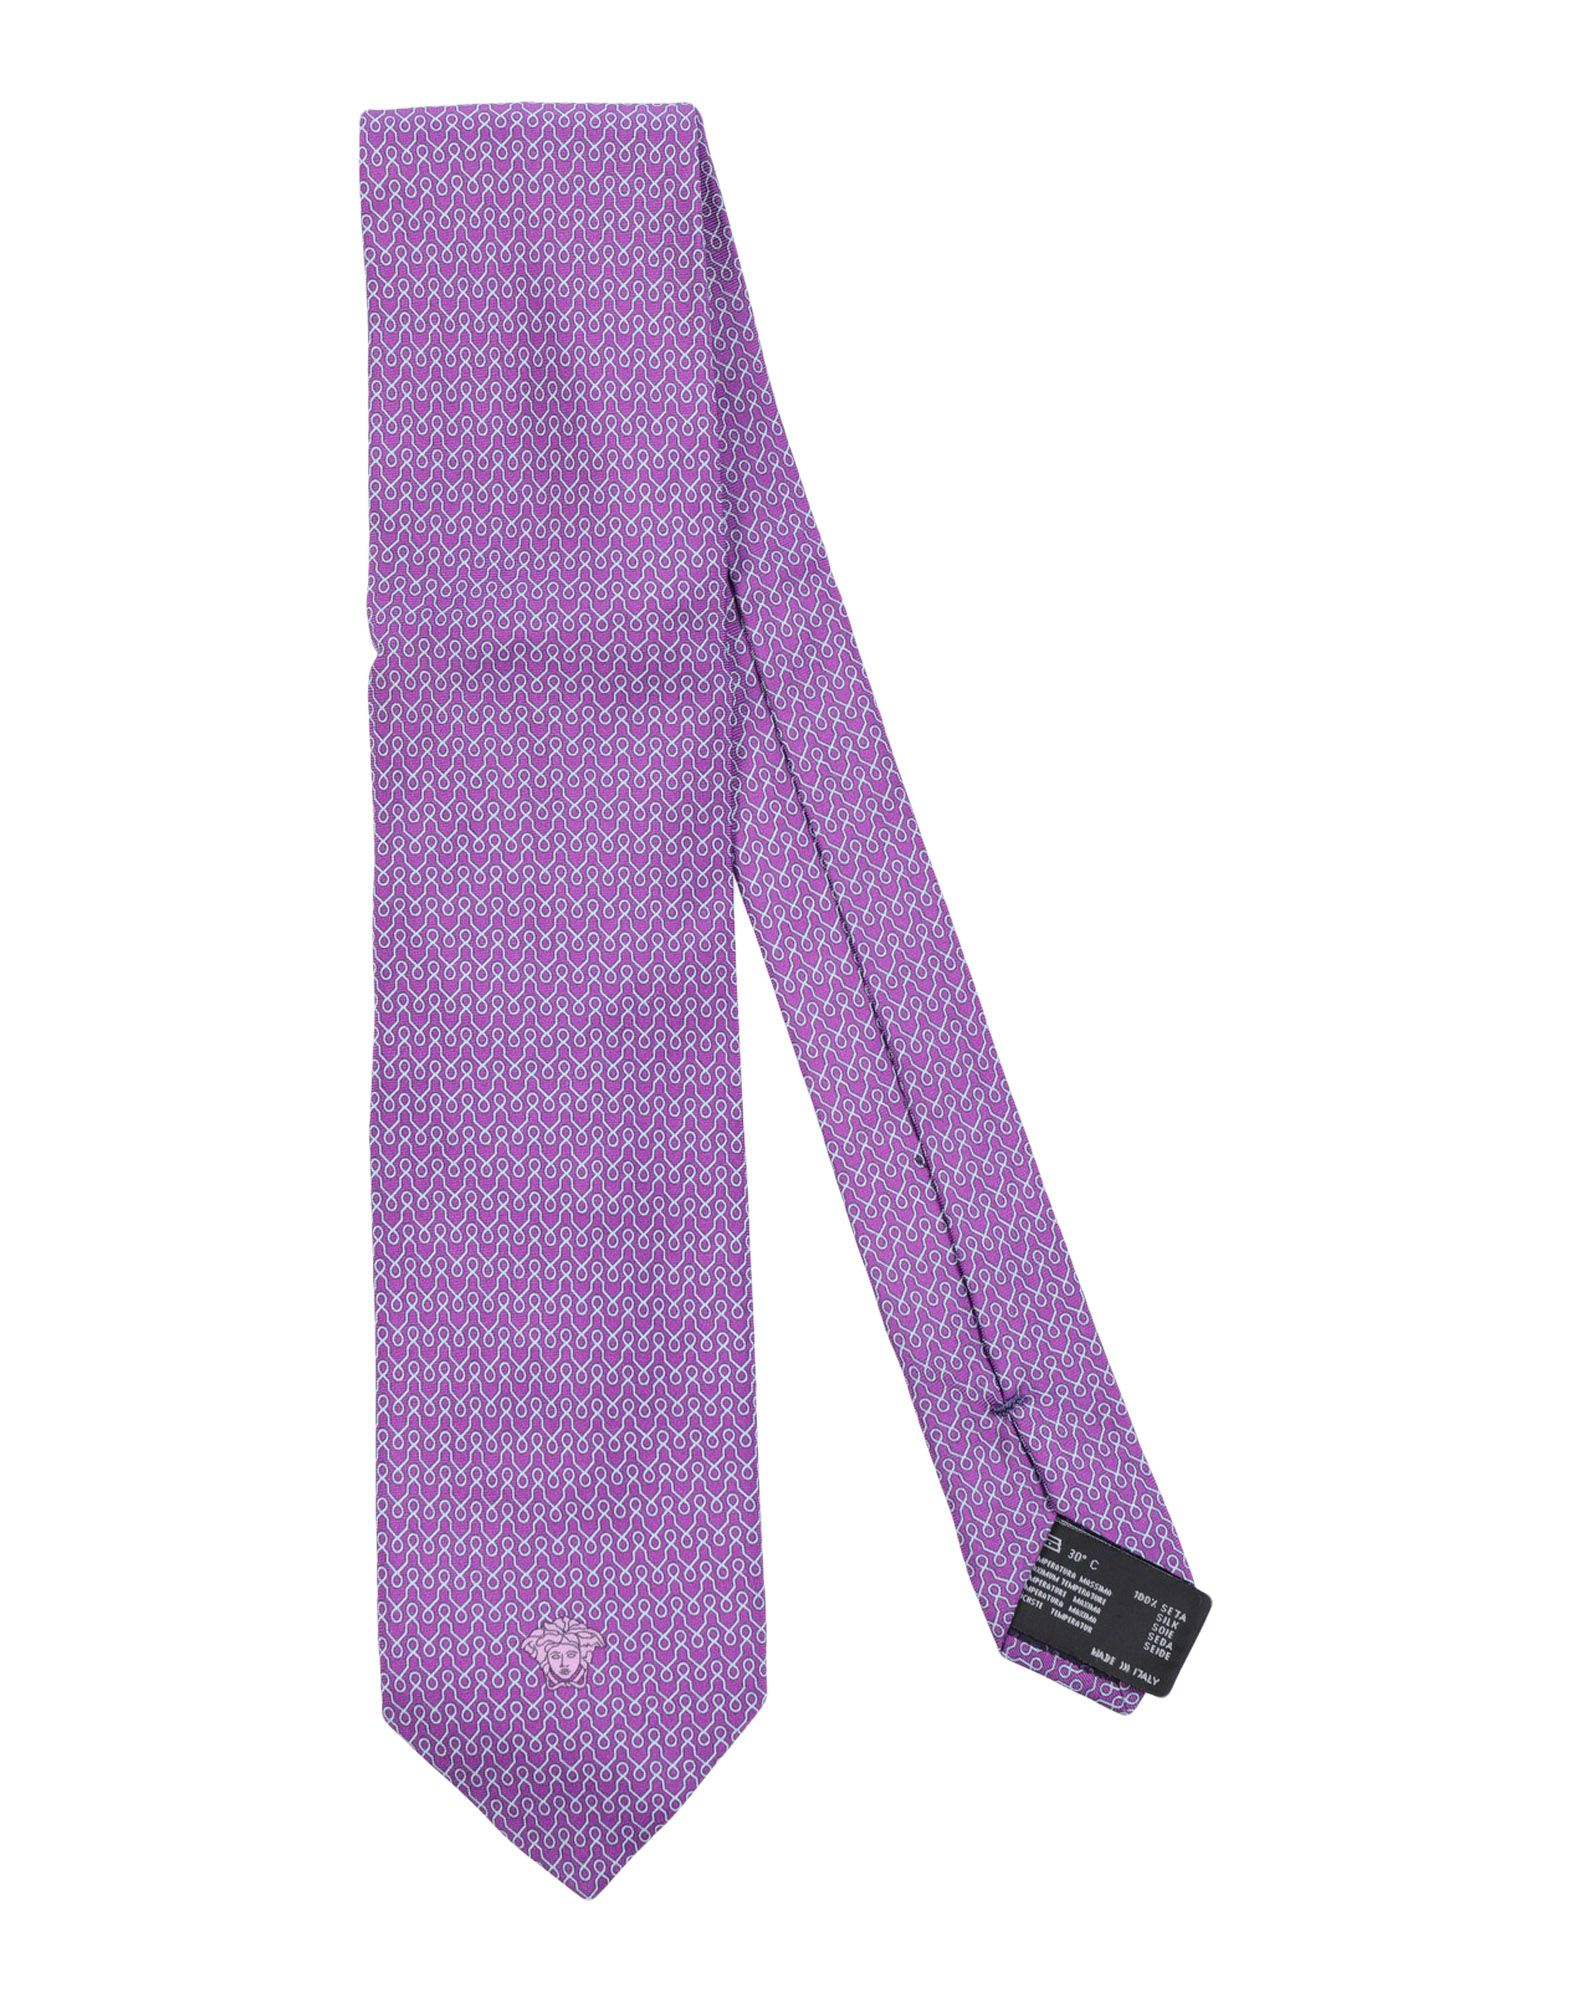 VERSACE Галстук versace бордовый галстук в клетку внизу с логотипом versace 821752 page 5 page 1